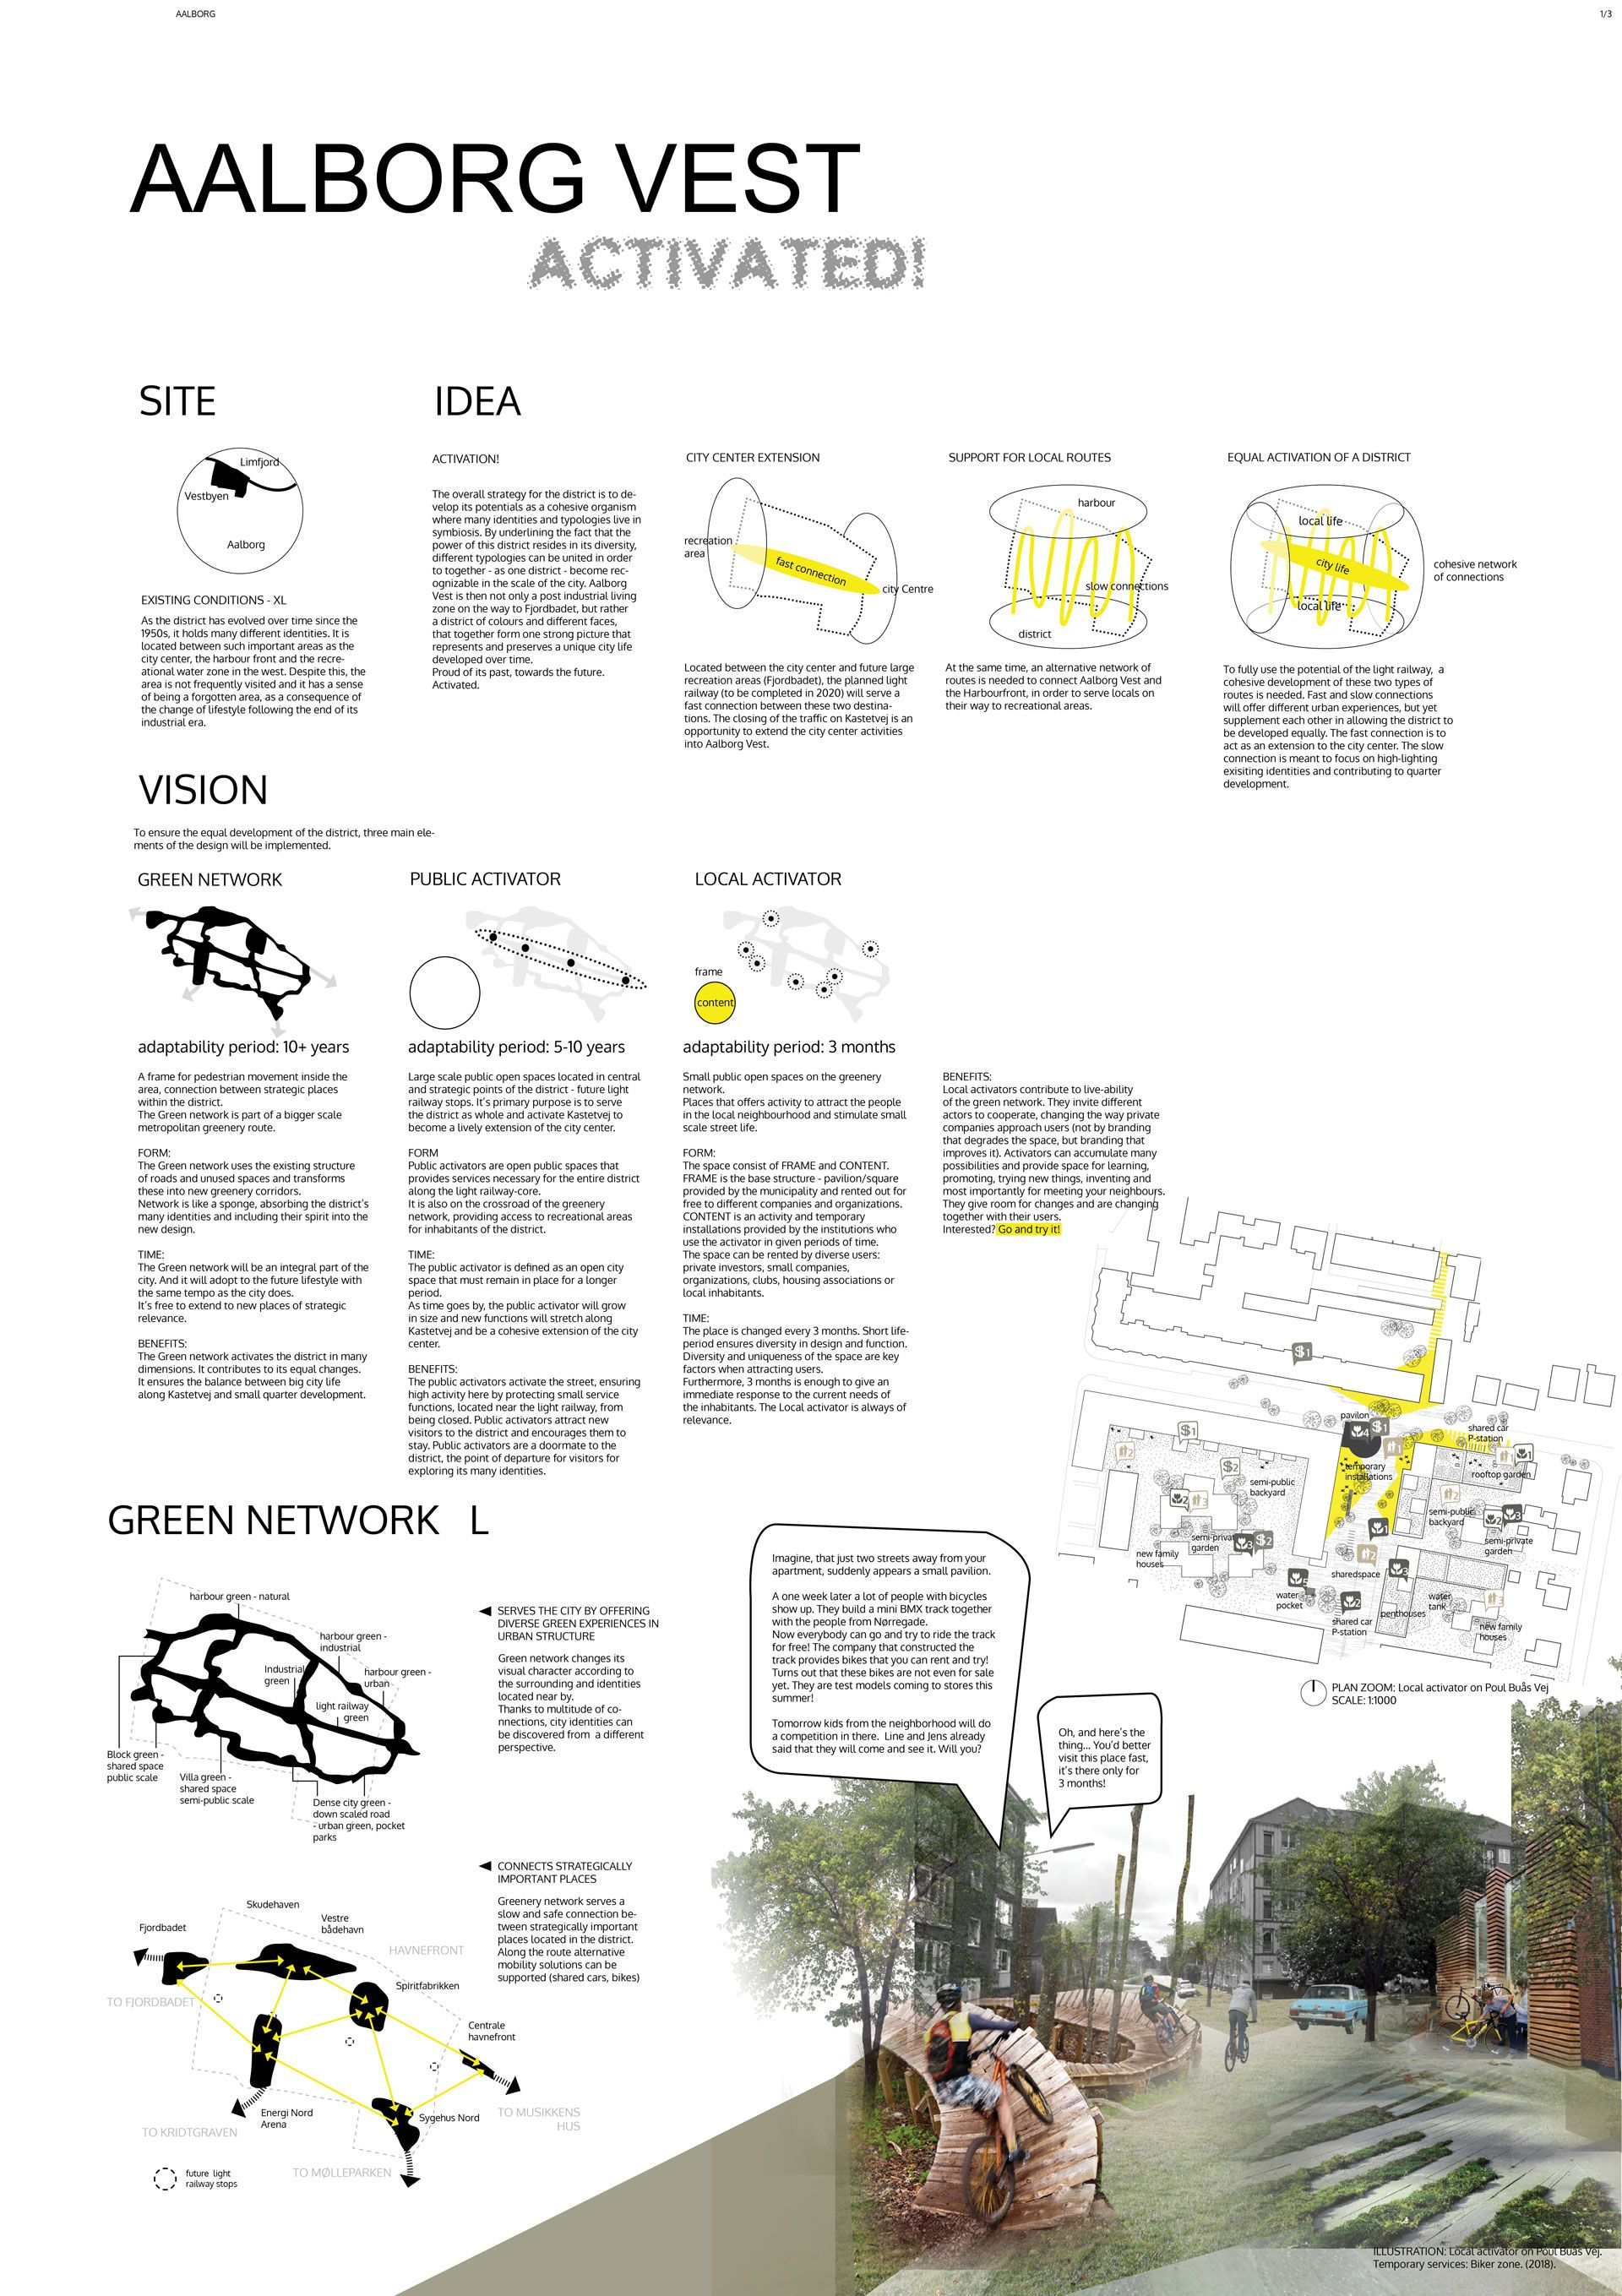 http://blogdeconcursos.com/resultados/img/res/038/h038_03_03a.jpgAalborg Vest Activated | special mention Architecture Competition Europan 12 | Aalborg, Denmark | Anna Gancewska